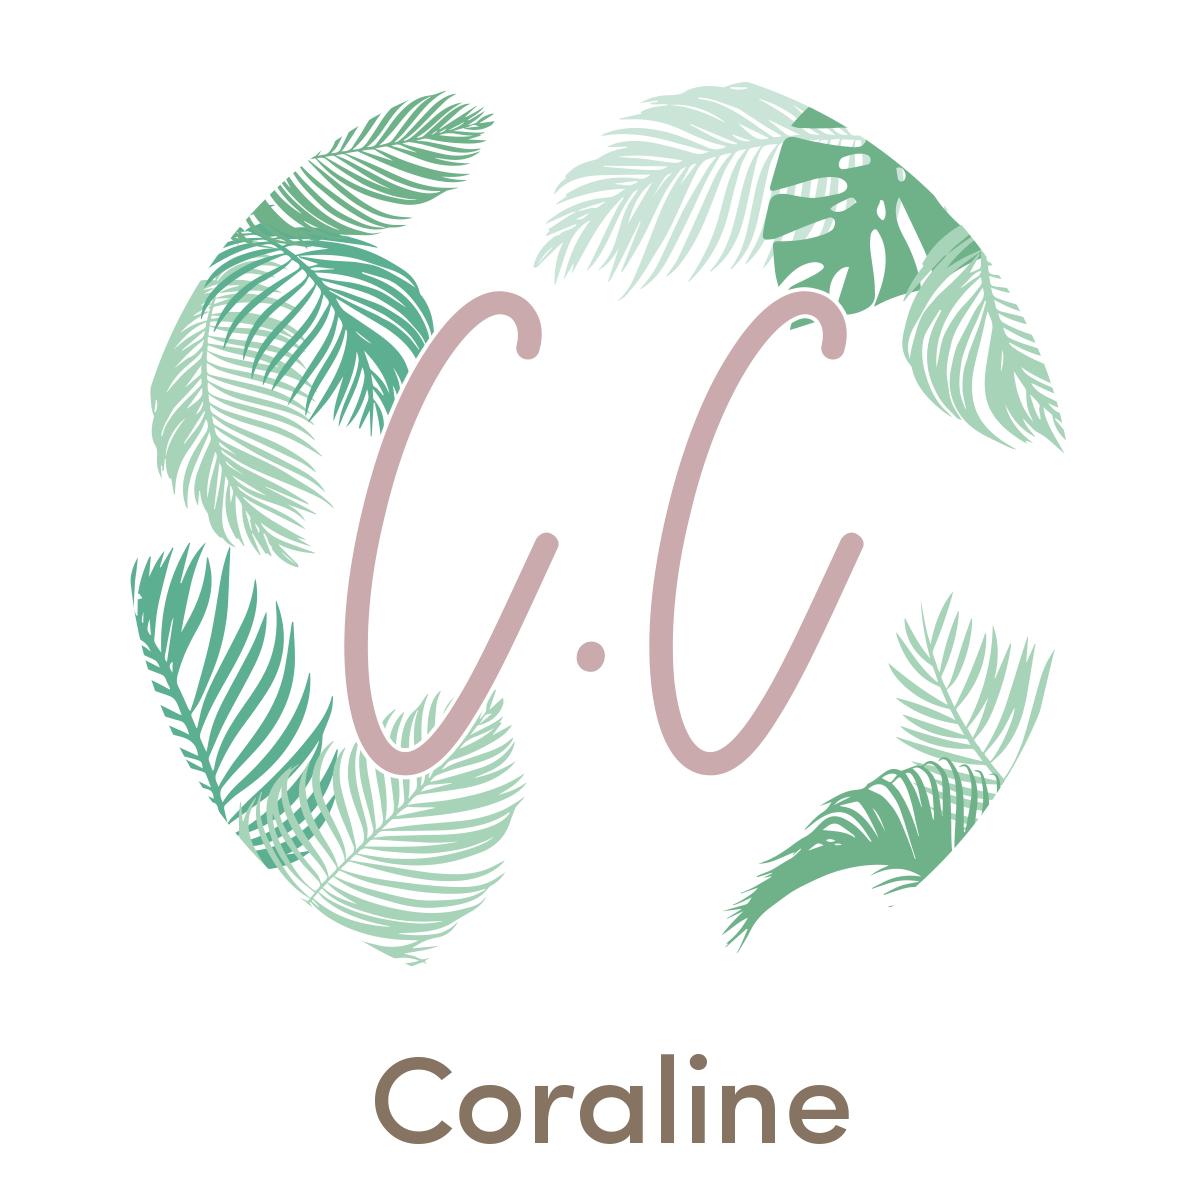 coraline_cc.png